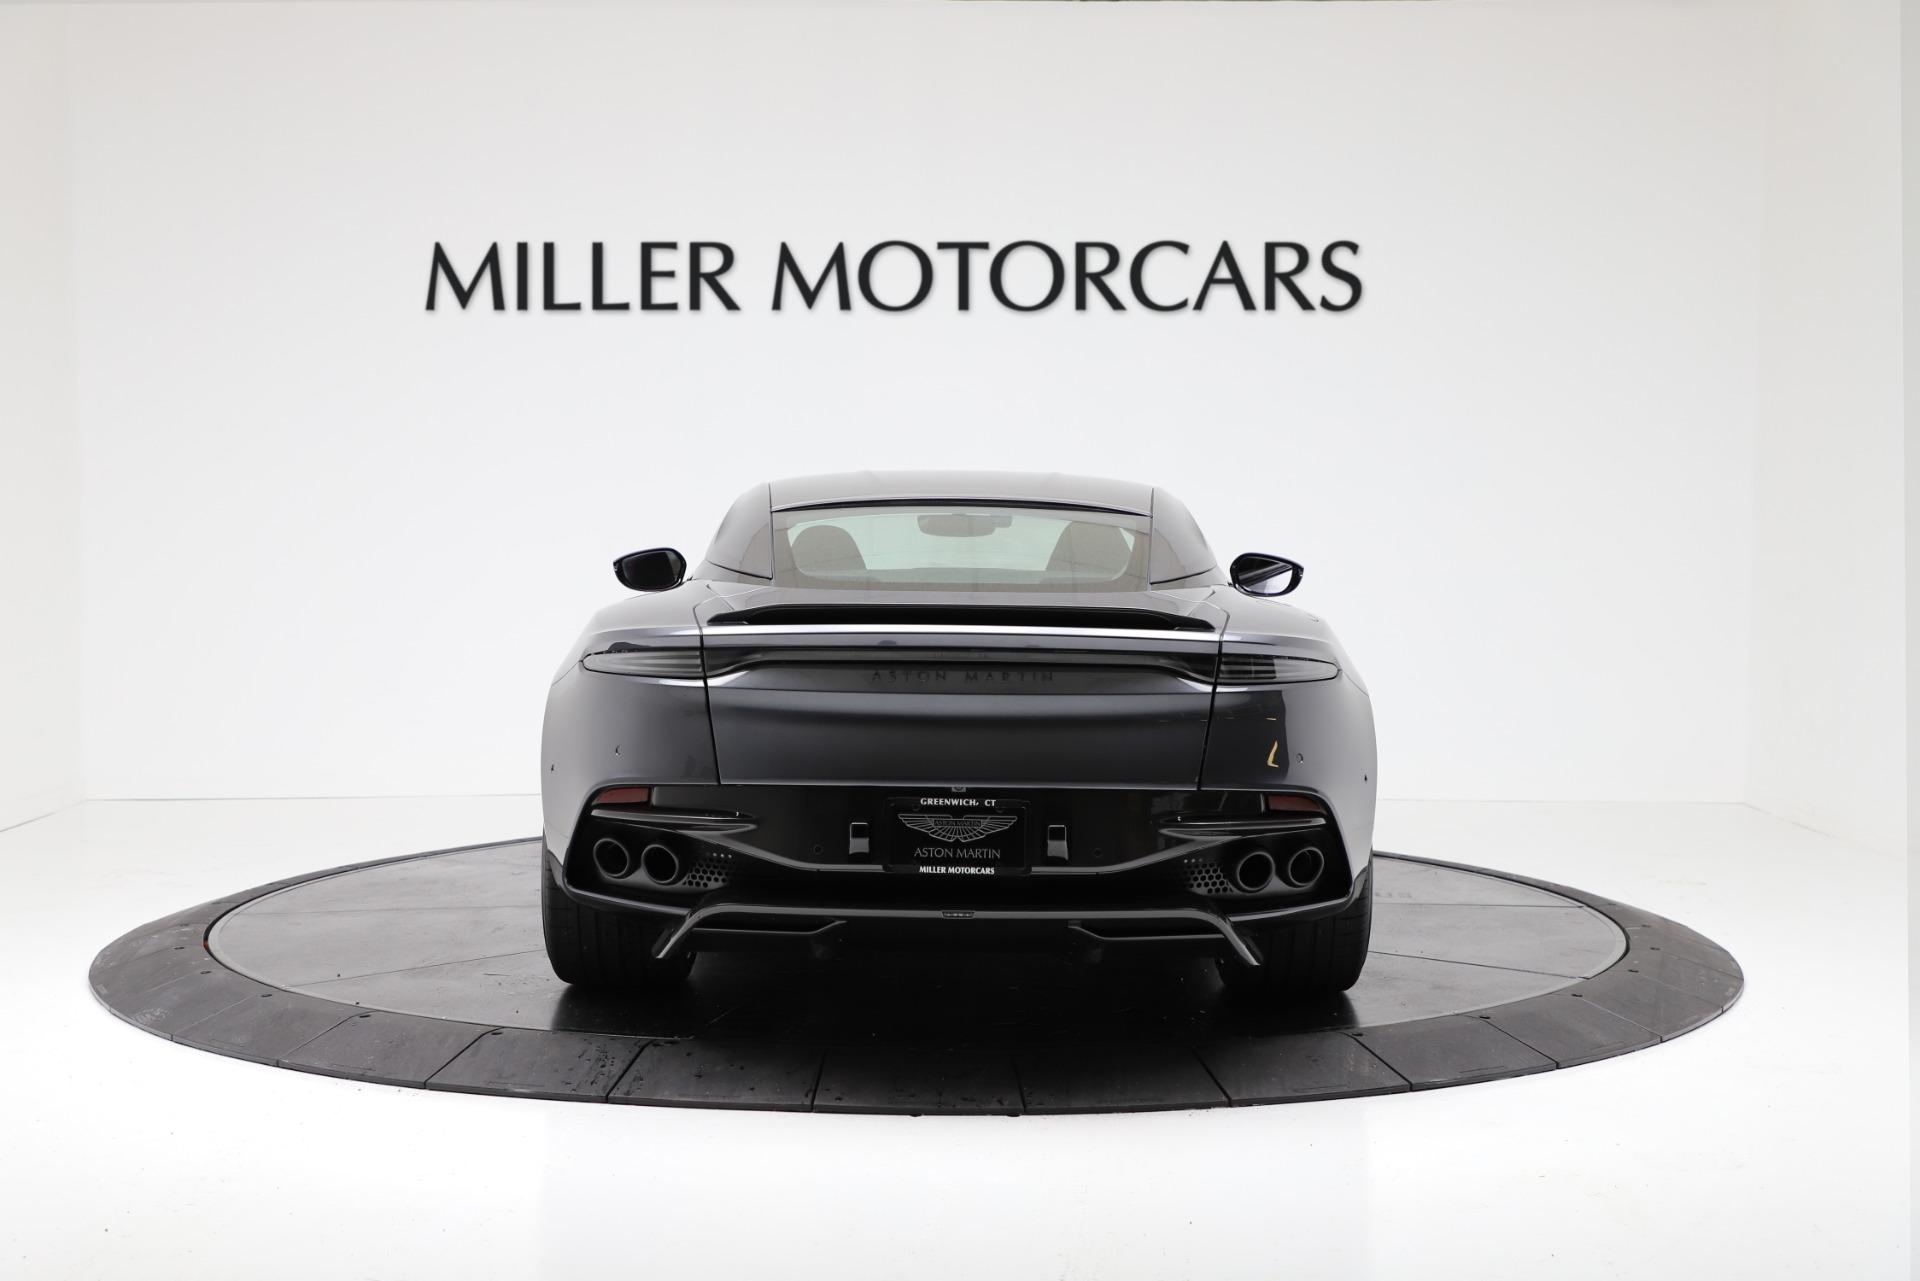 New 2019 Aston Martin DBS Superleggera Coupe For Sale In Greenwich, CT 3318_p5